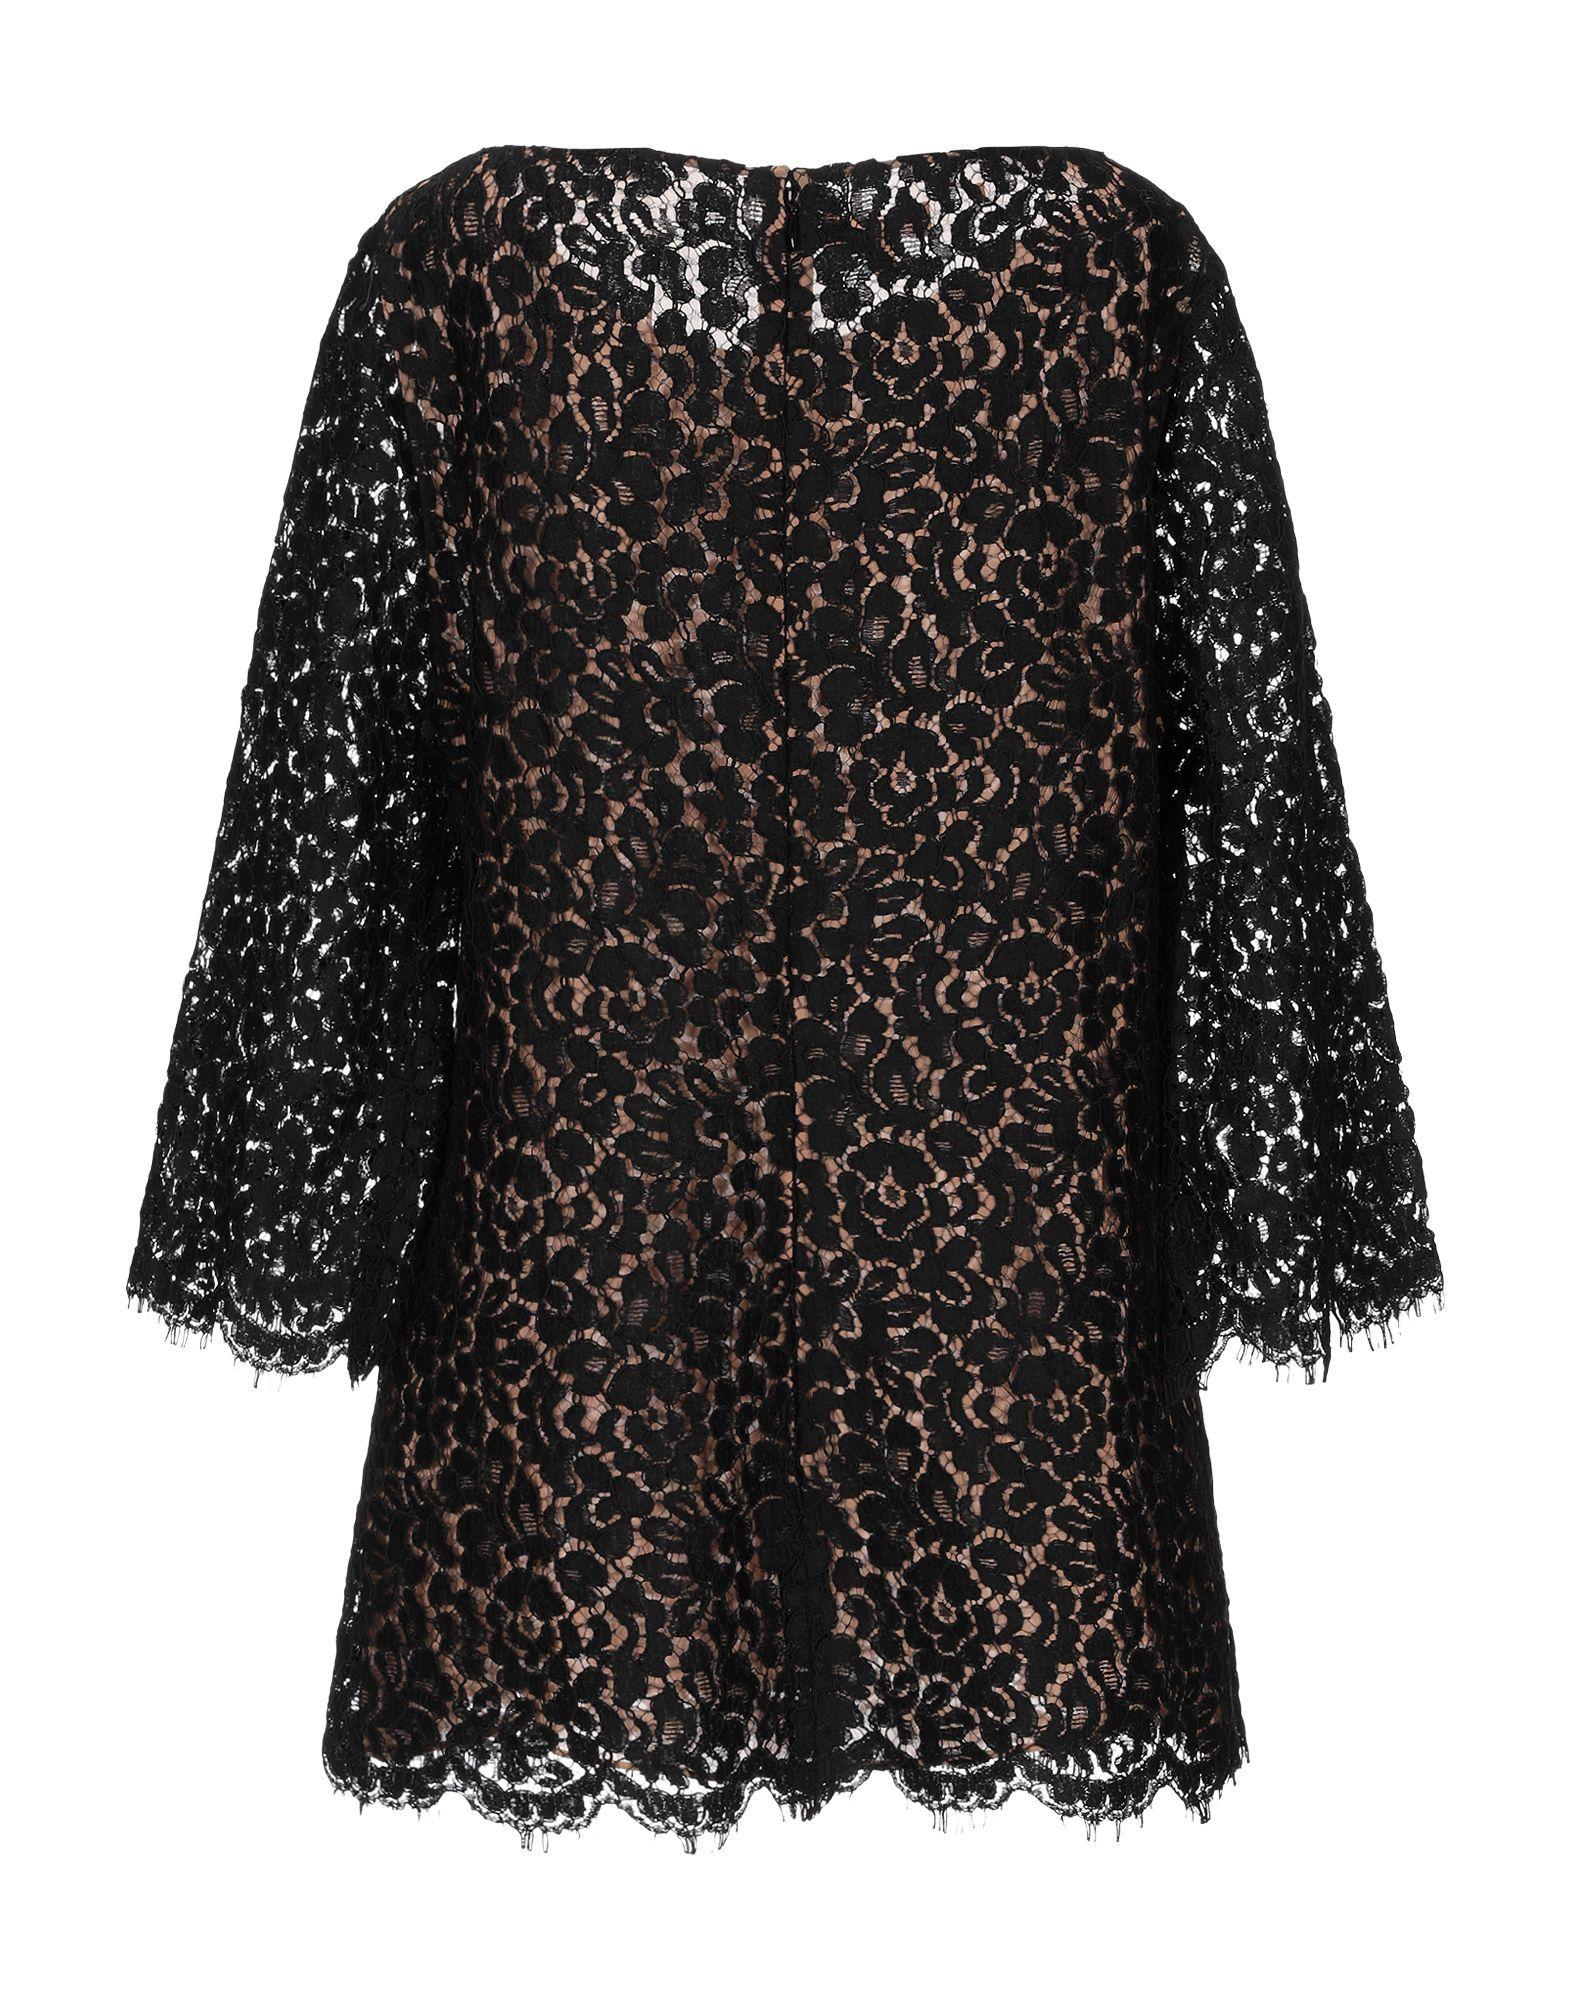 Shirts Michael Kors Collection Black Women's Cotton